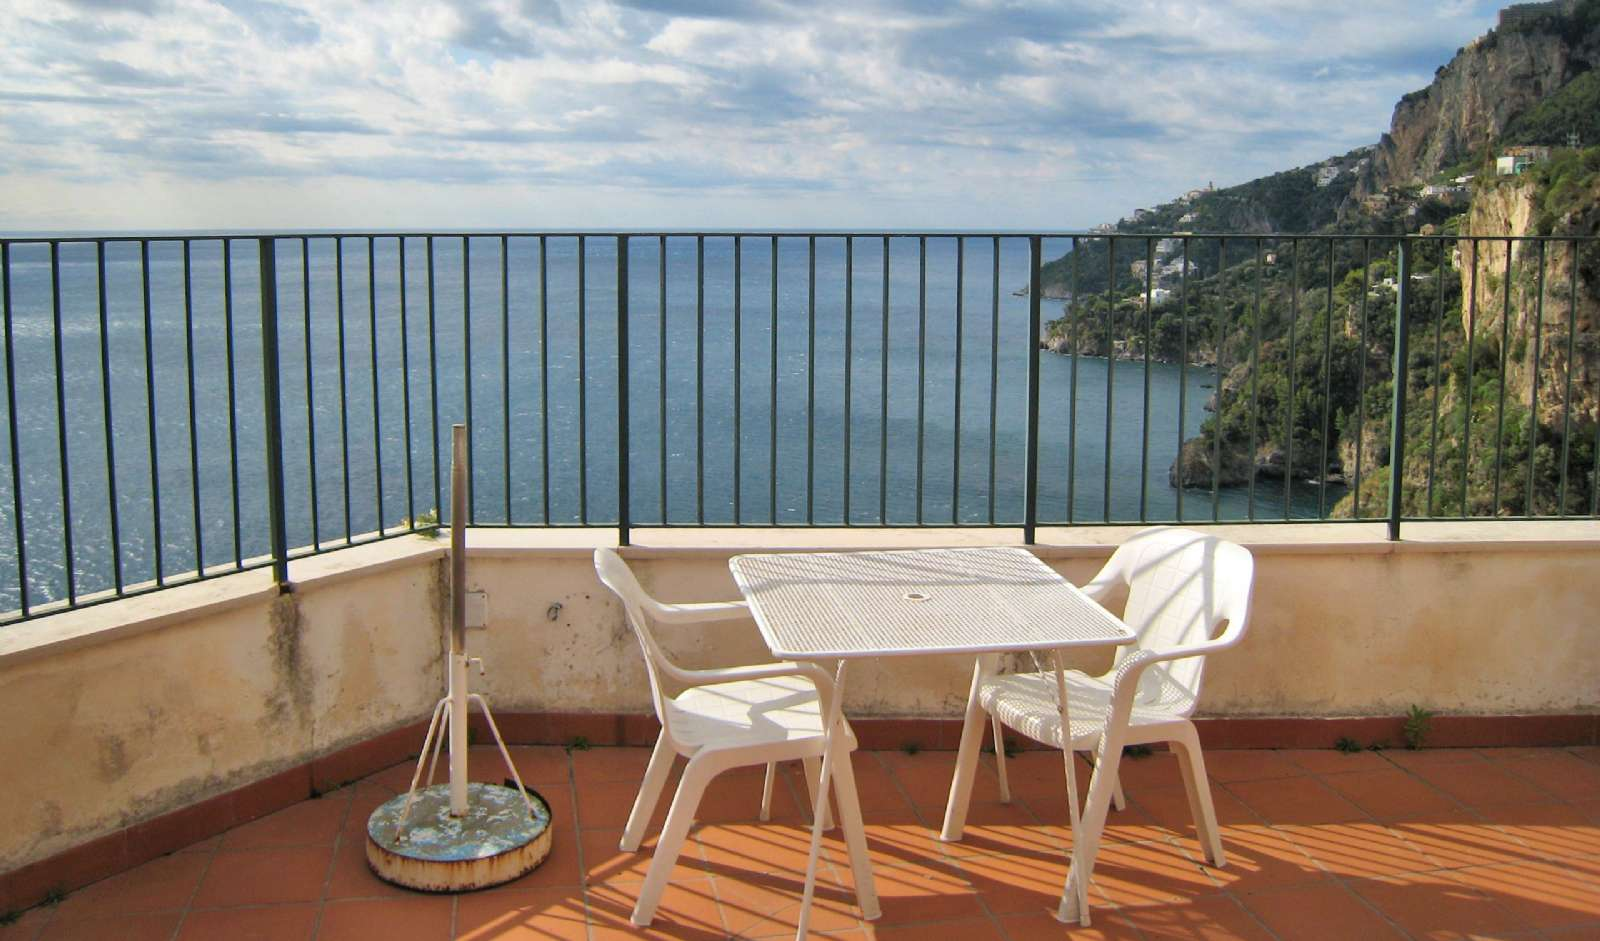 Nyd havudsigten fra terrassen